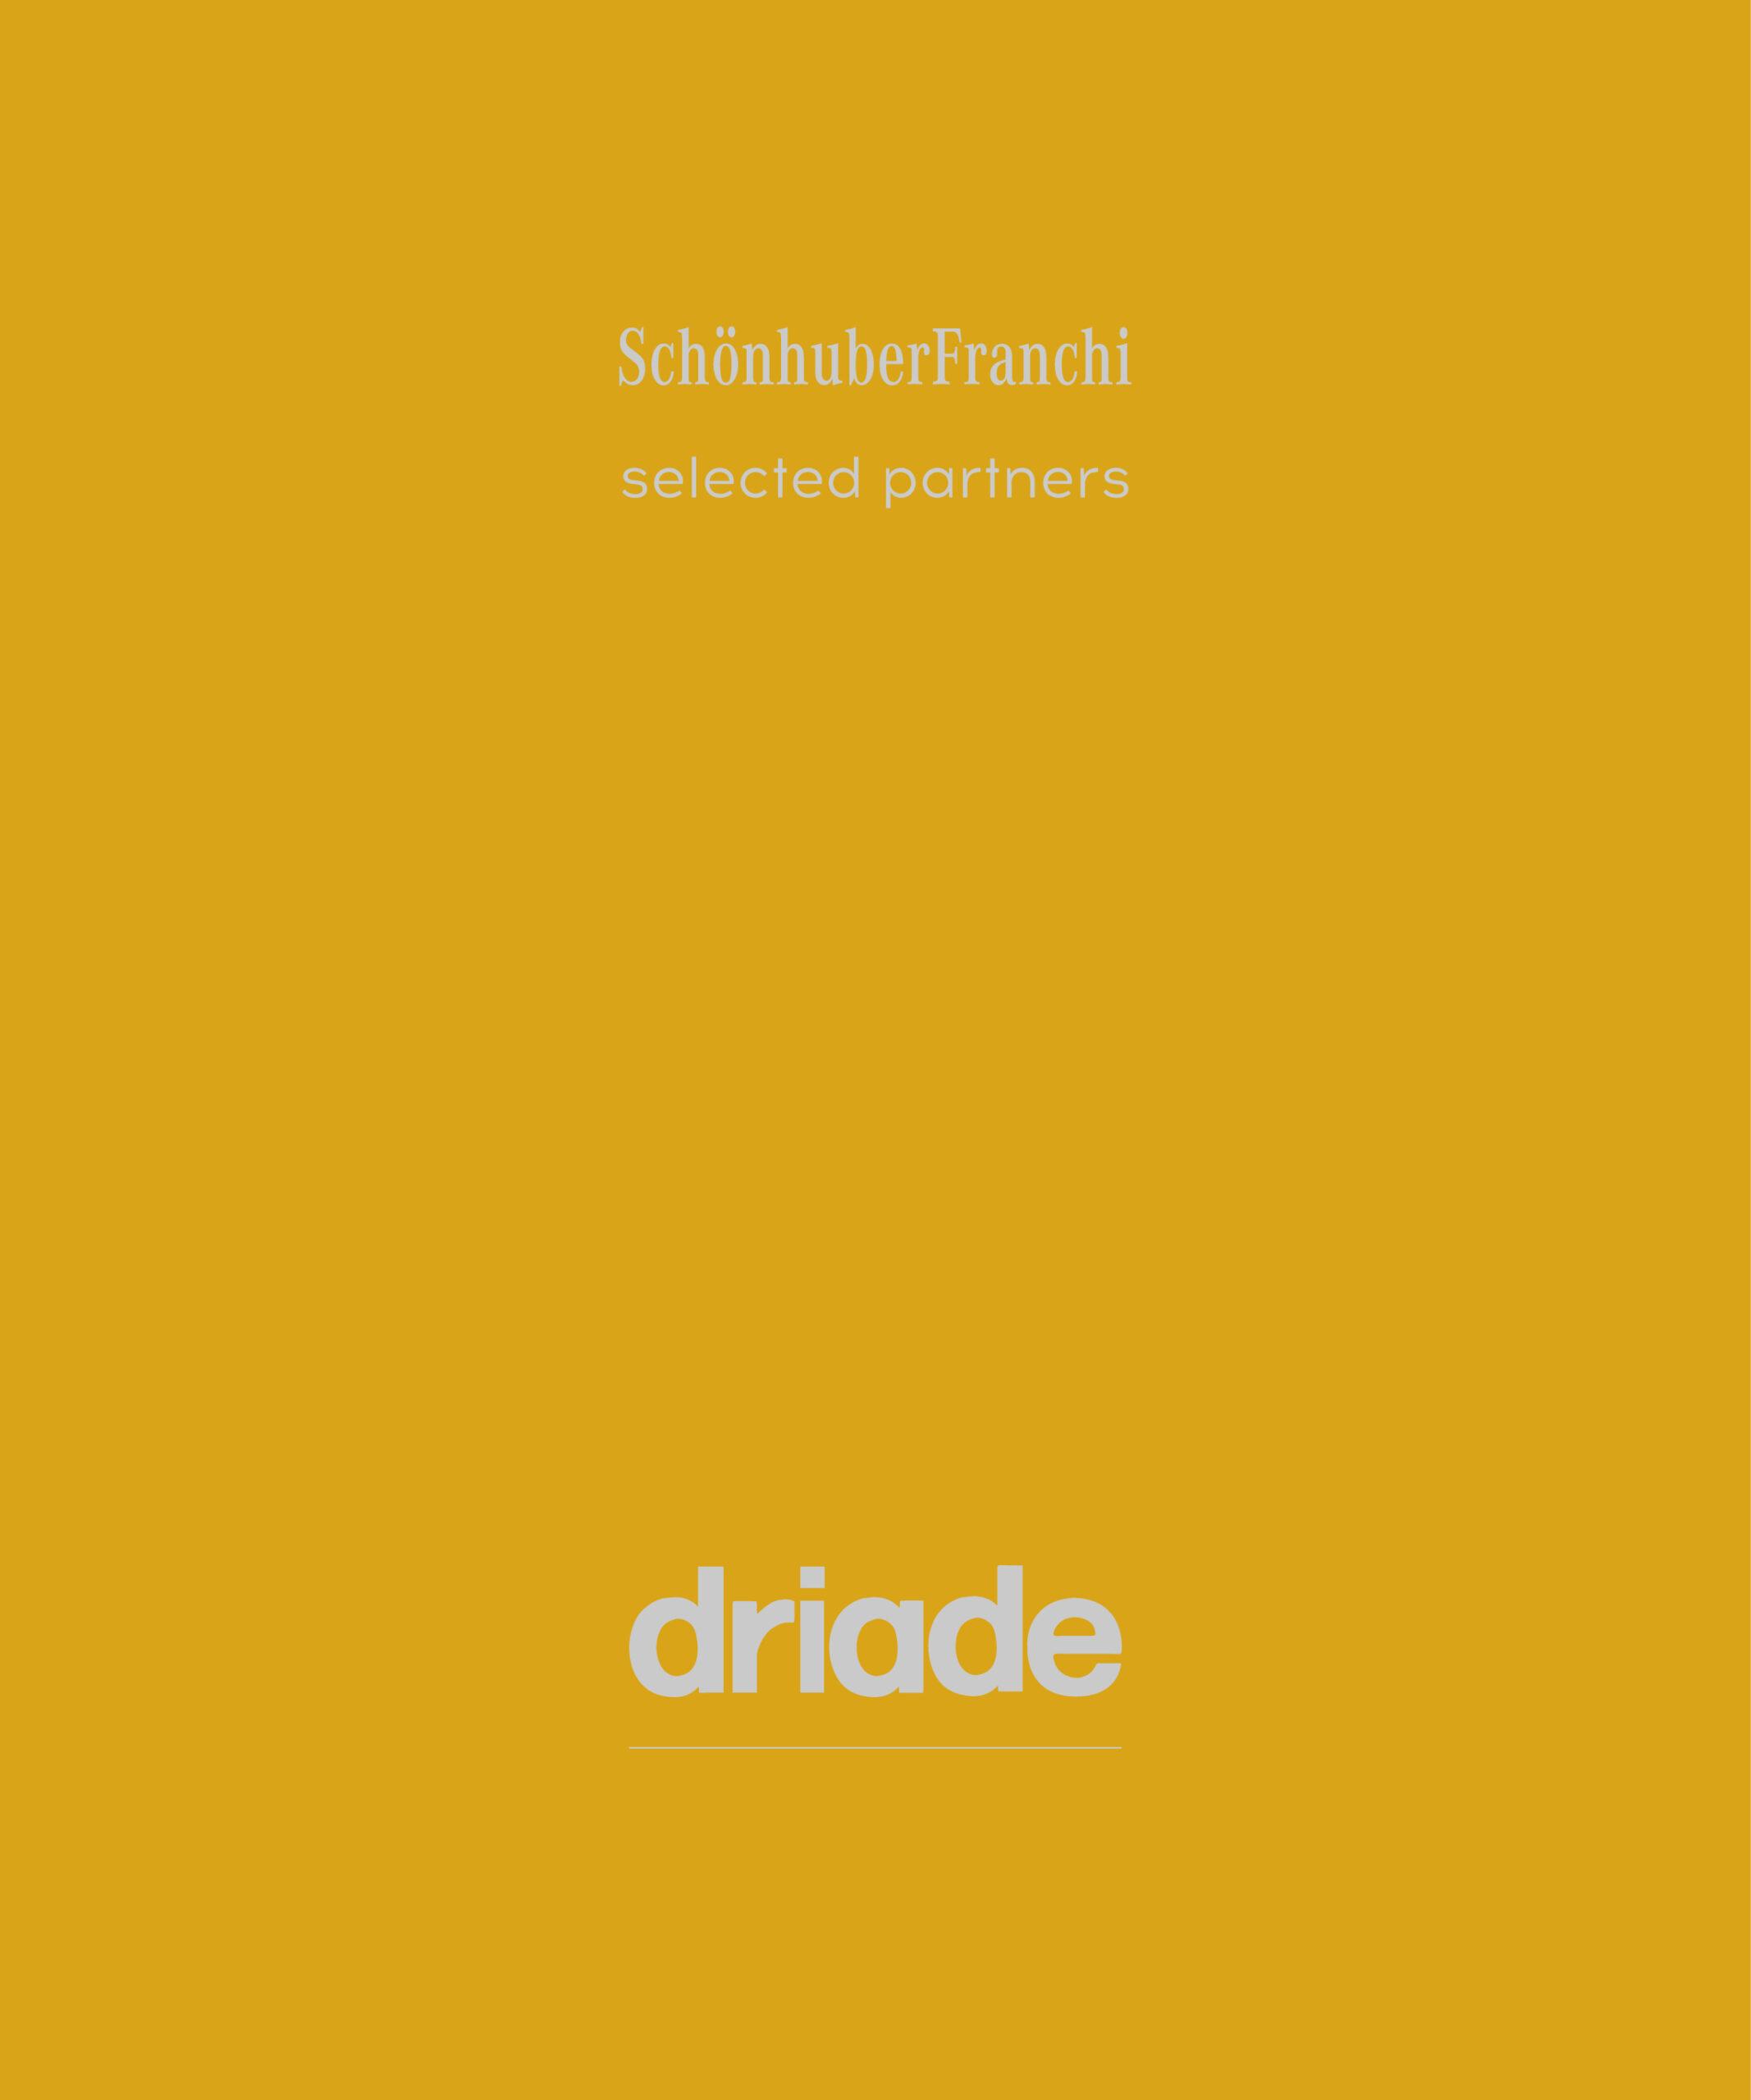 https://www.schoenhuberfranchi.it/wp-content/uploads/2021/06/cover-driade-1-scaled.jpg